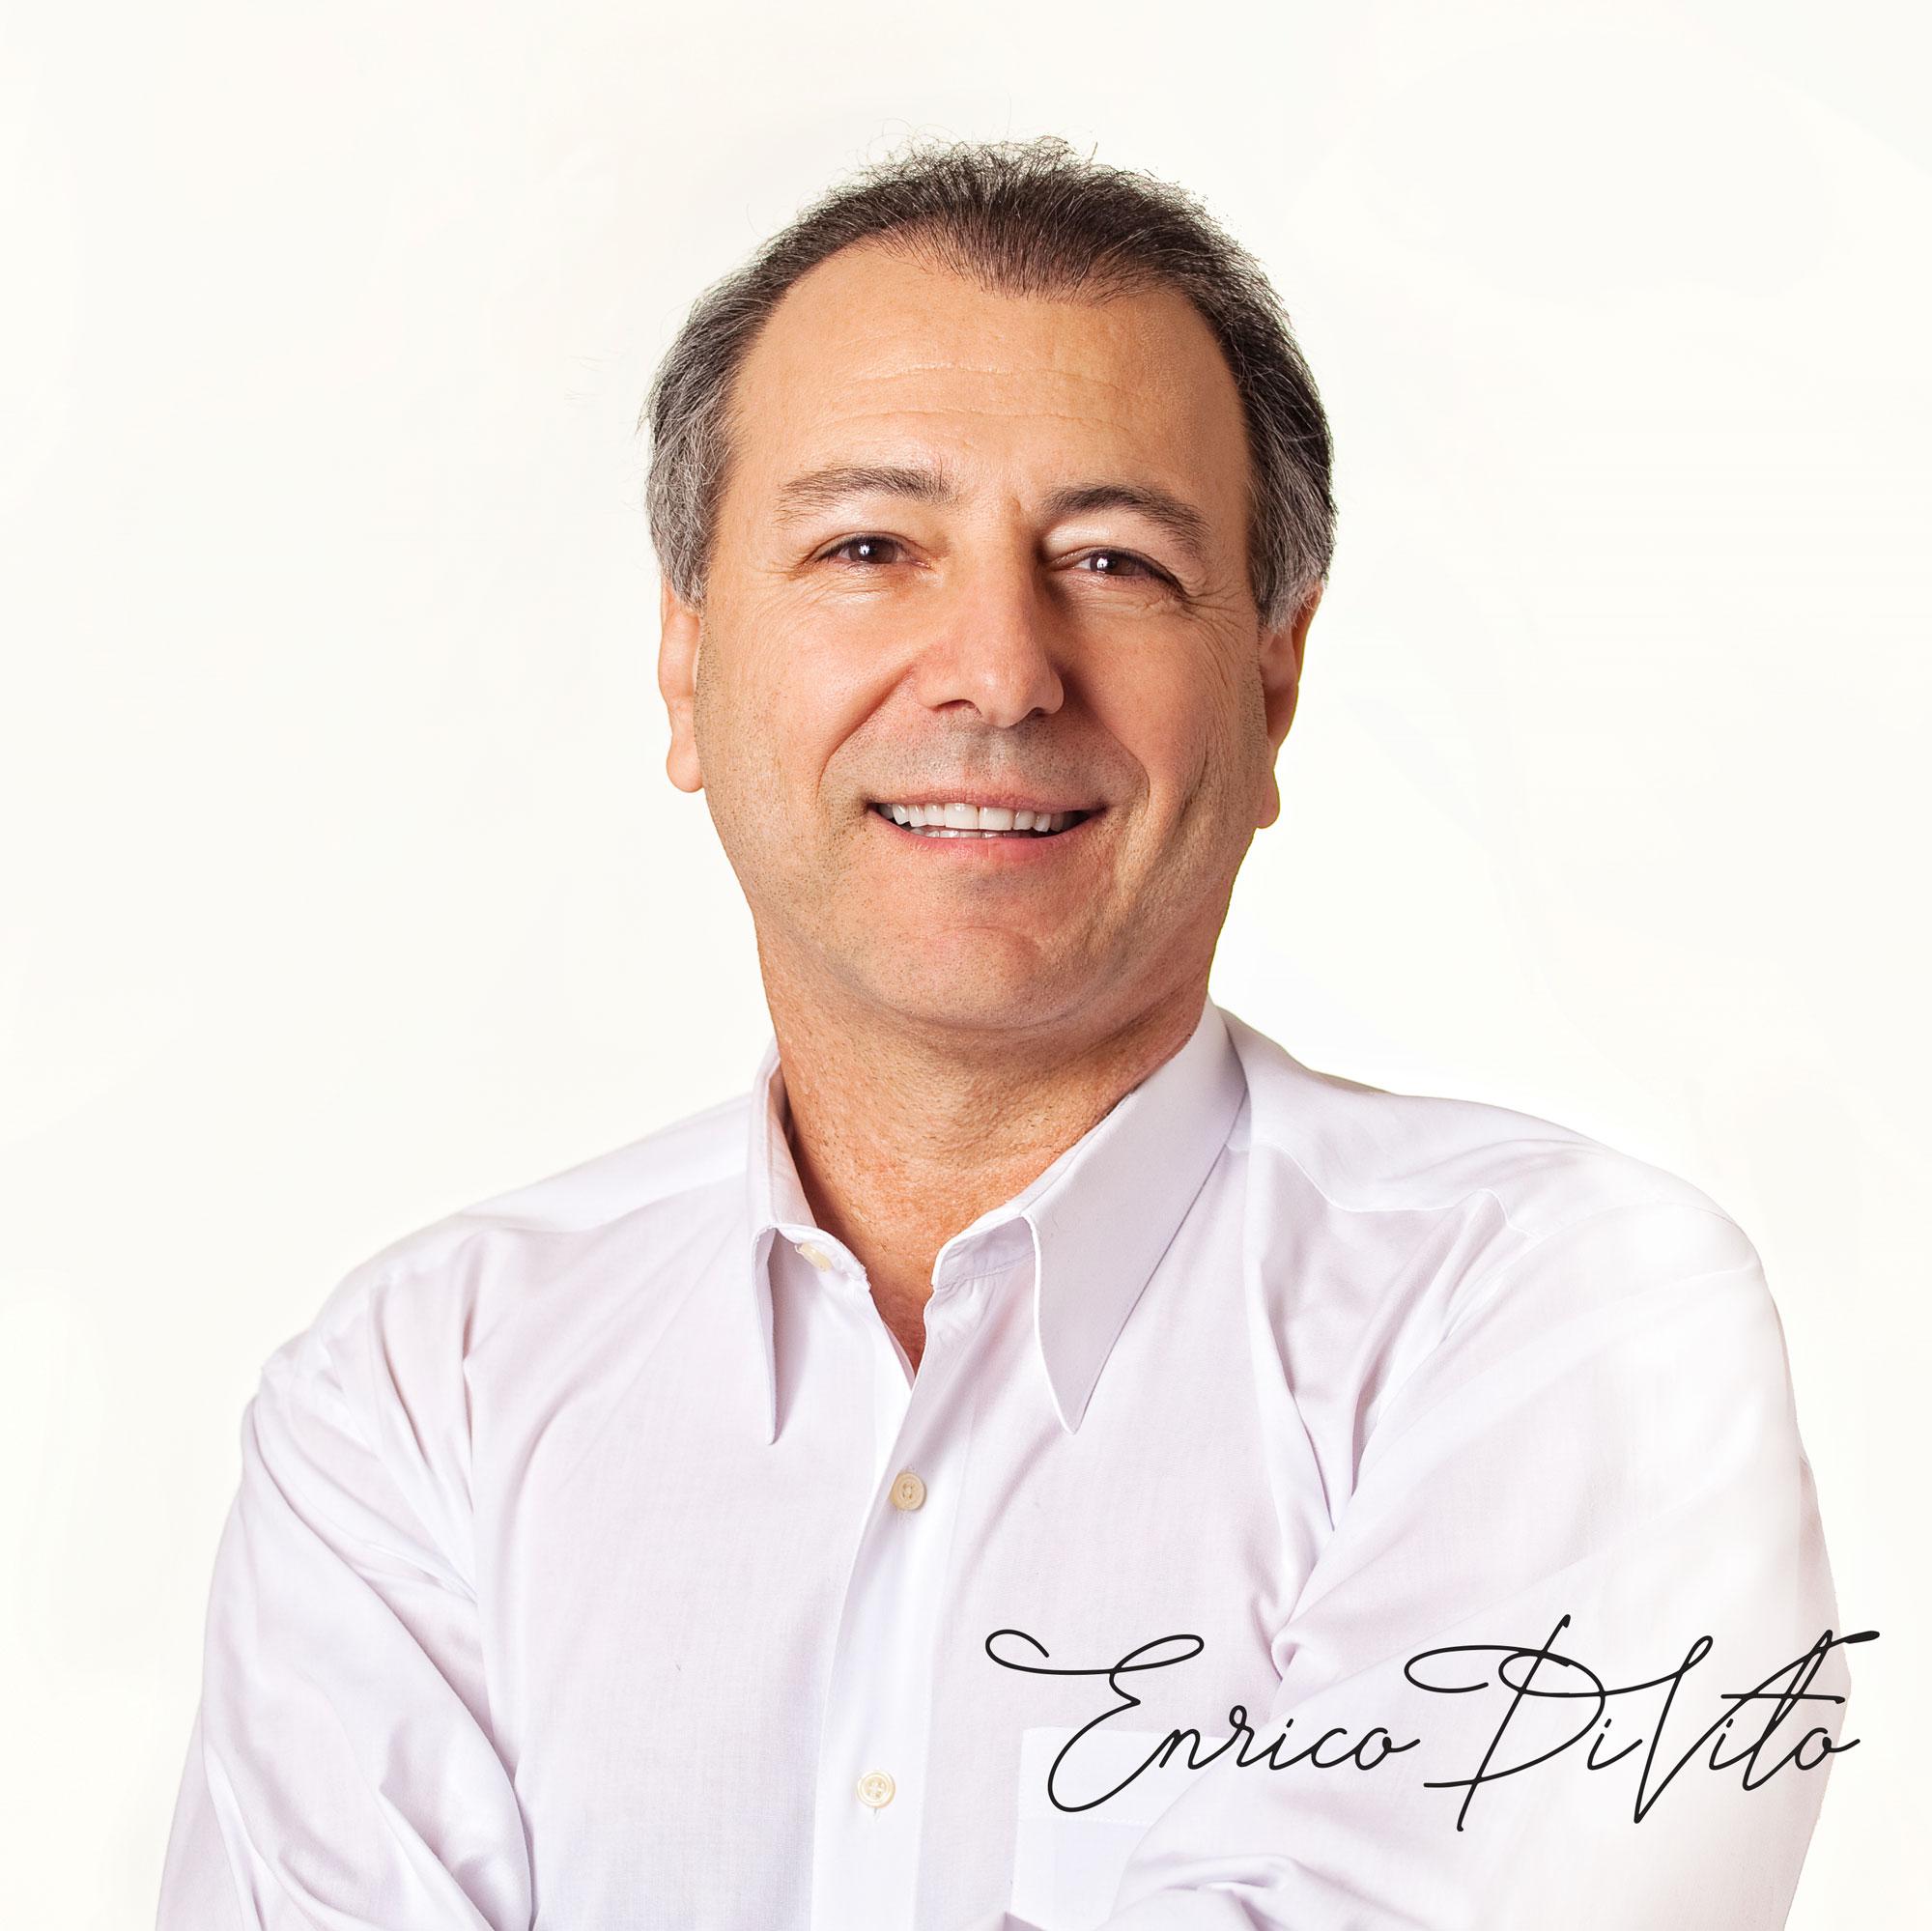 Dr-Enrico-Divito